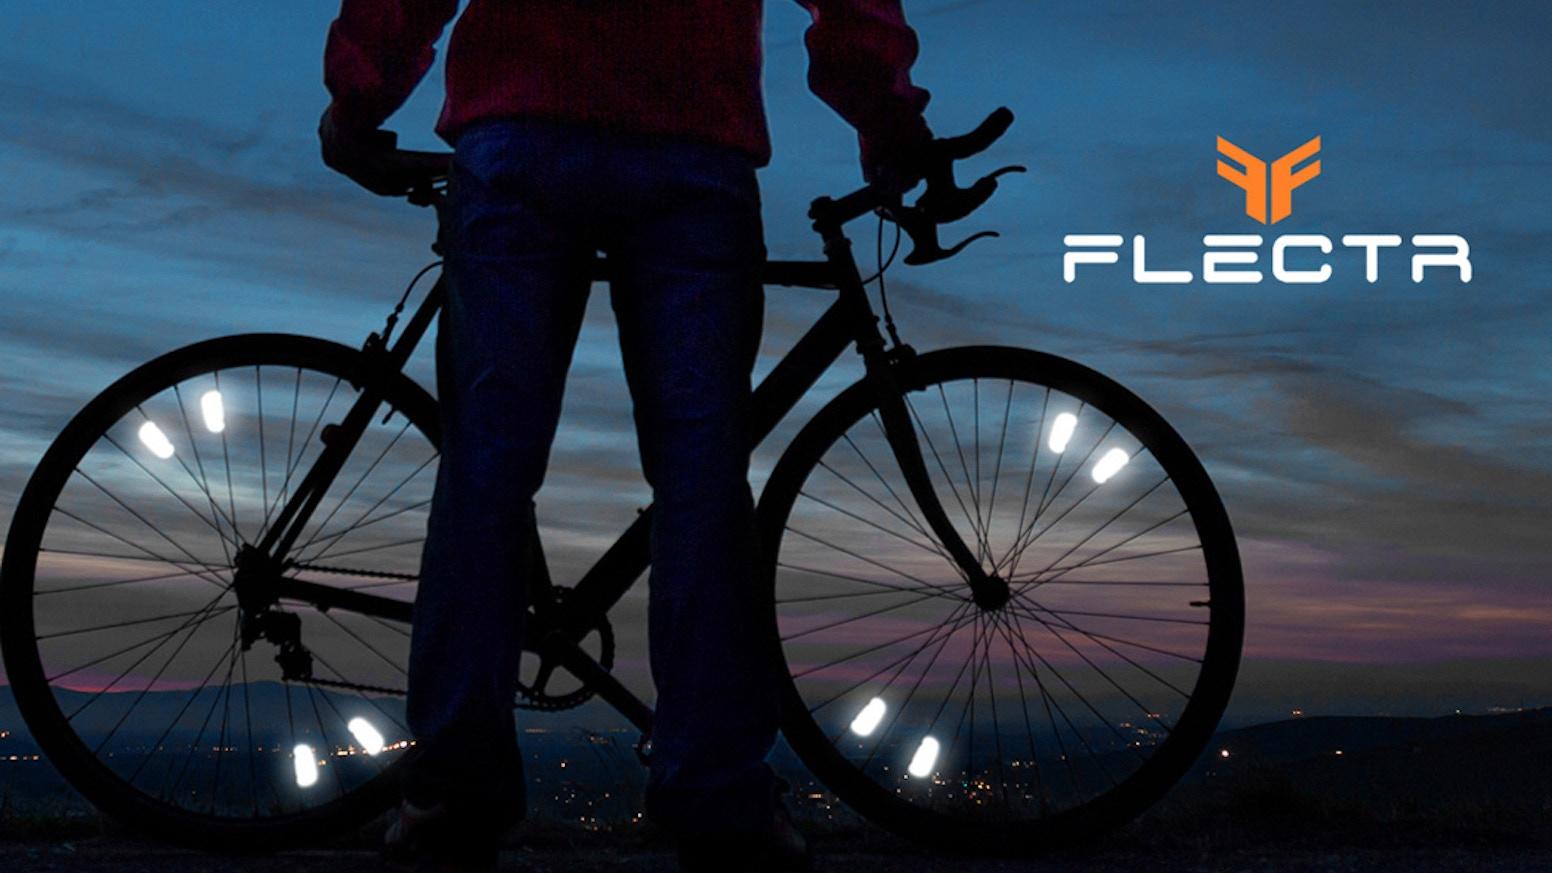 cc6ba1e12f4 FLECTR - Ultra performance wheel reflectors by The Outsider Team —  Kickstarter